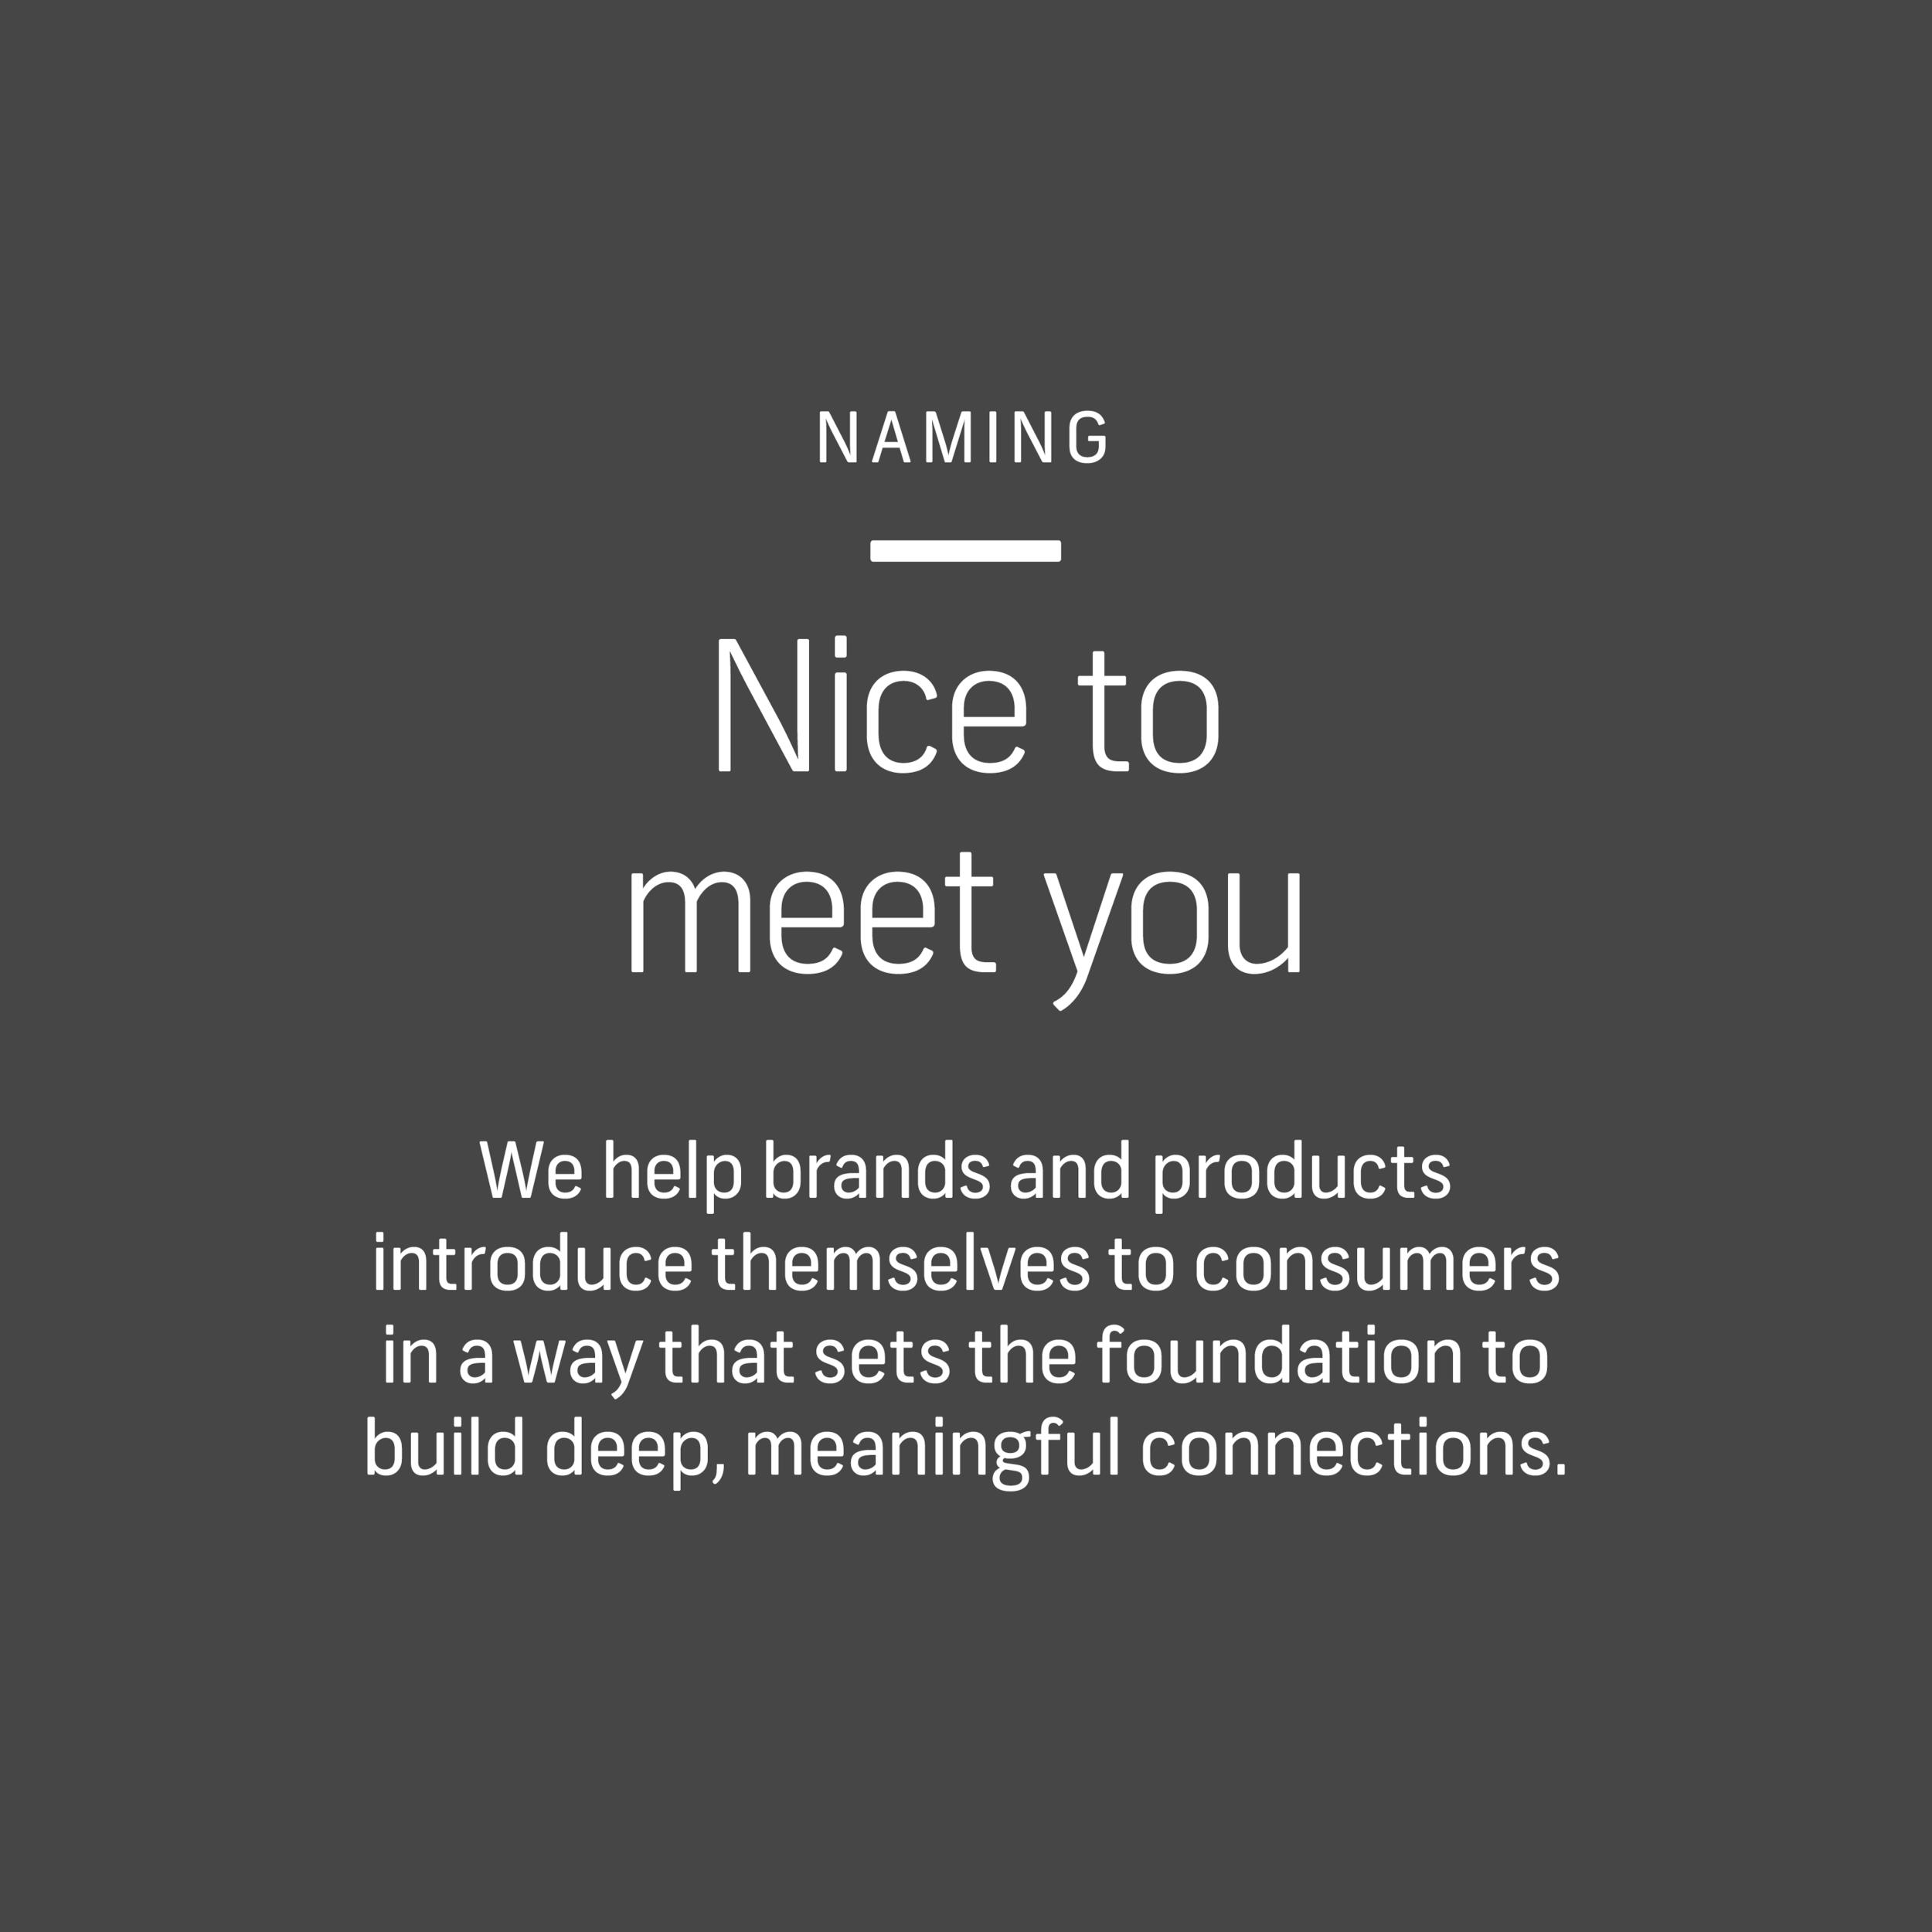 capabilities-headline-_naming.png